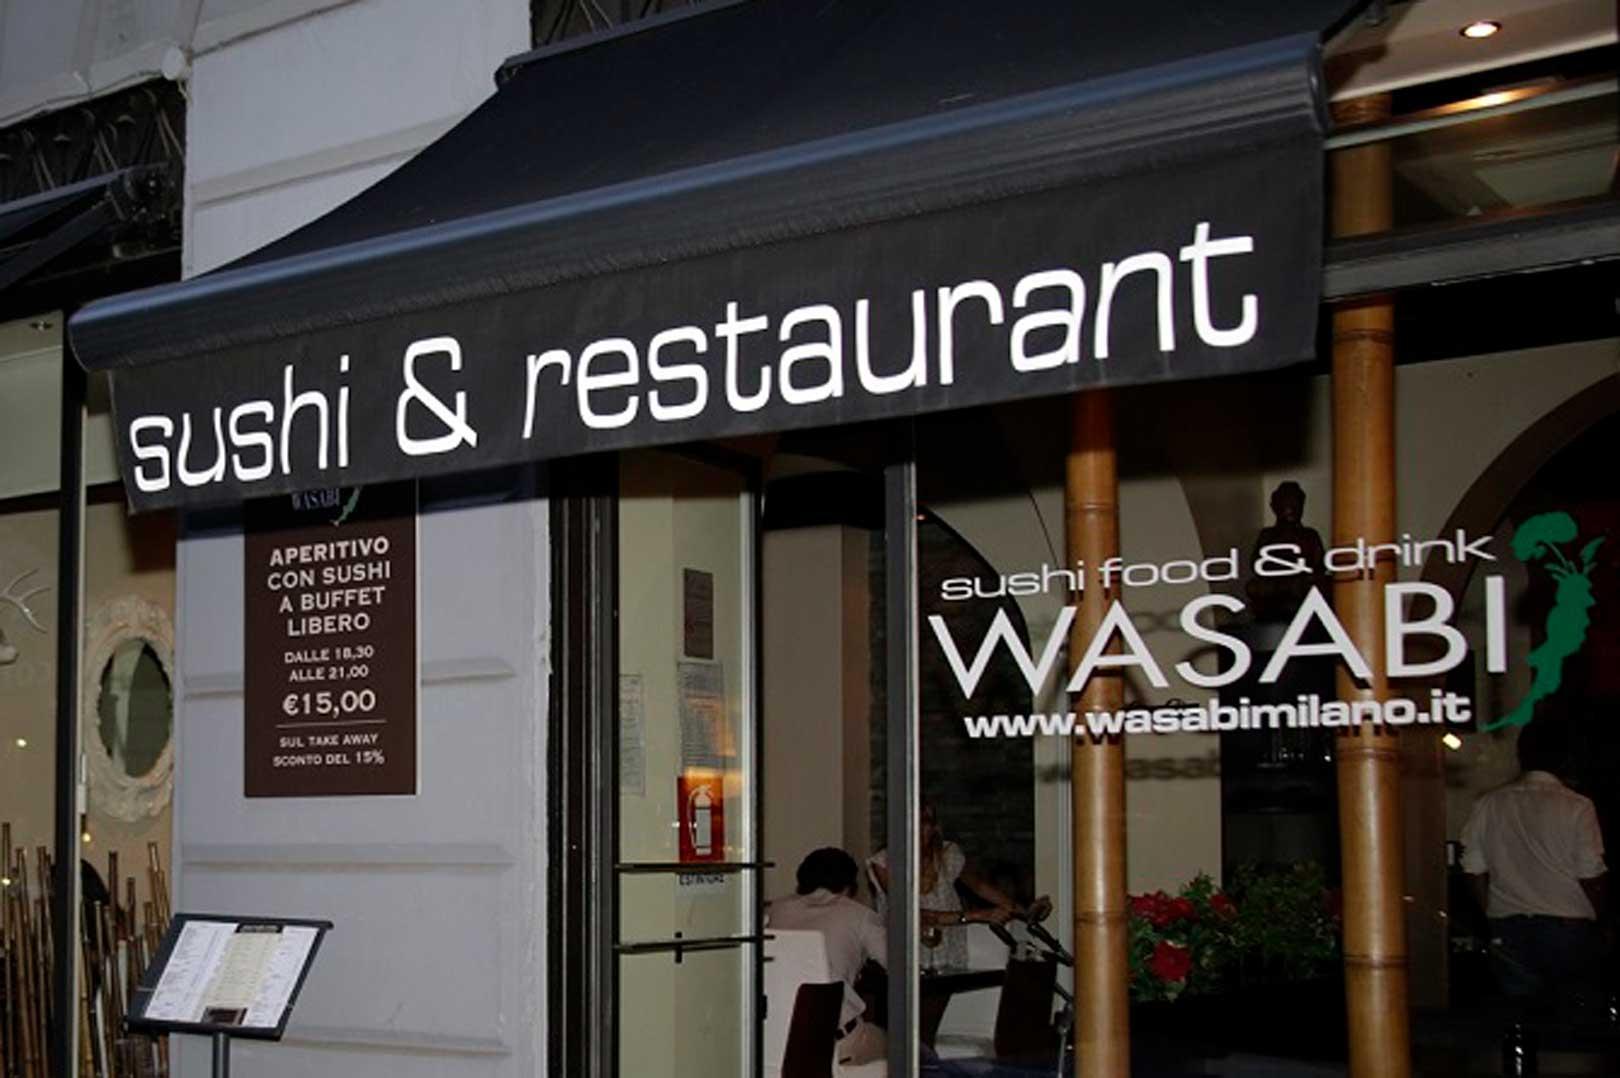 5-italian-things-that-america-needs-wasabi-sushi